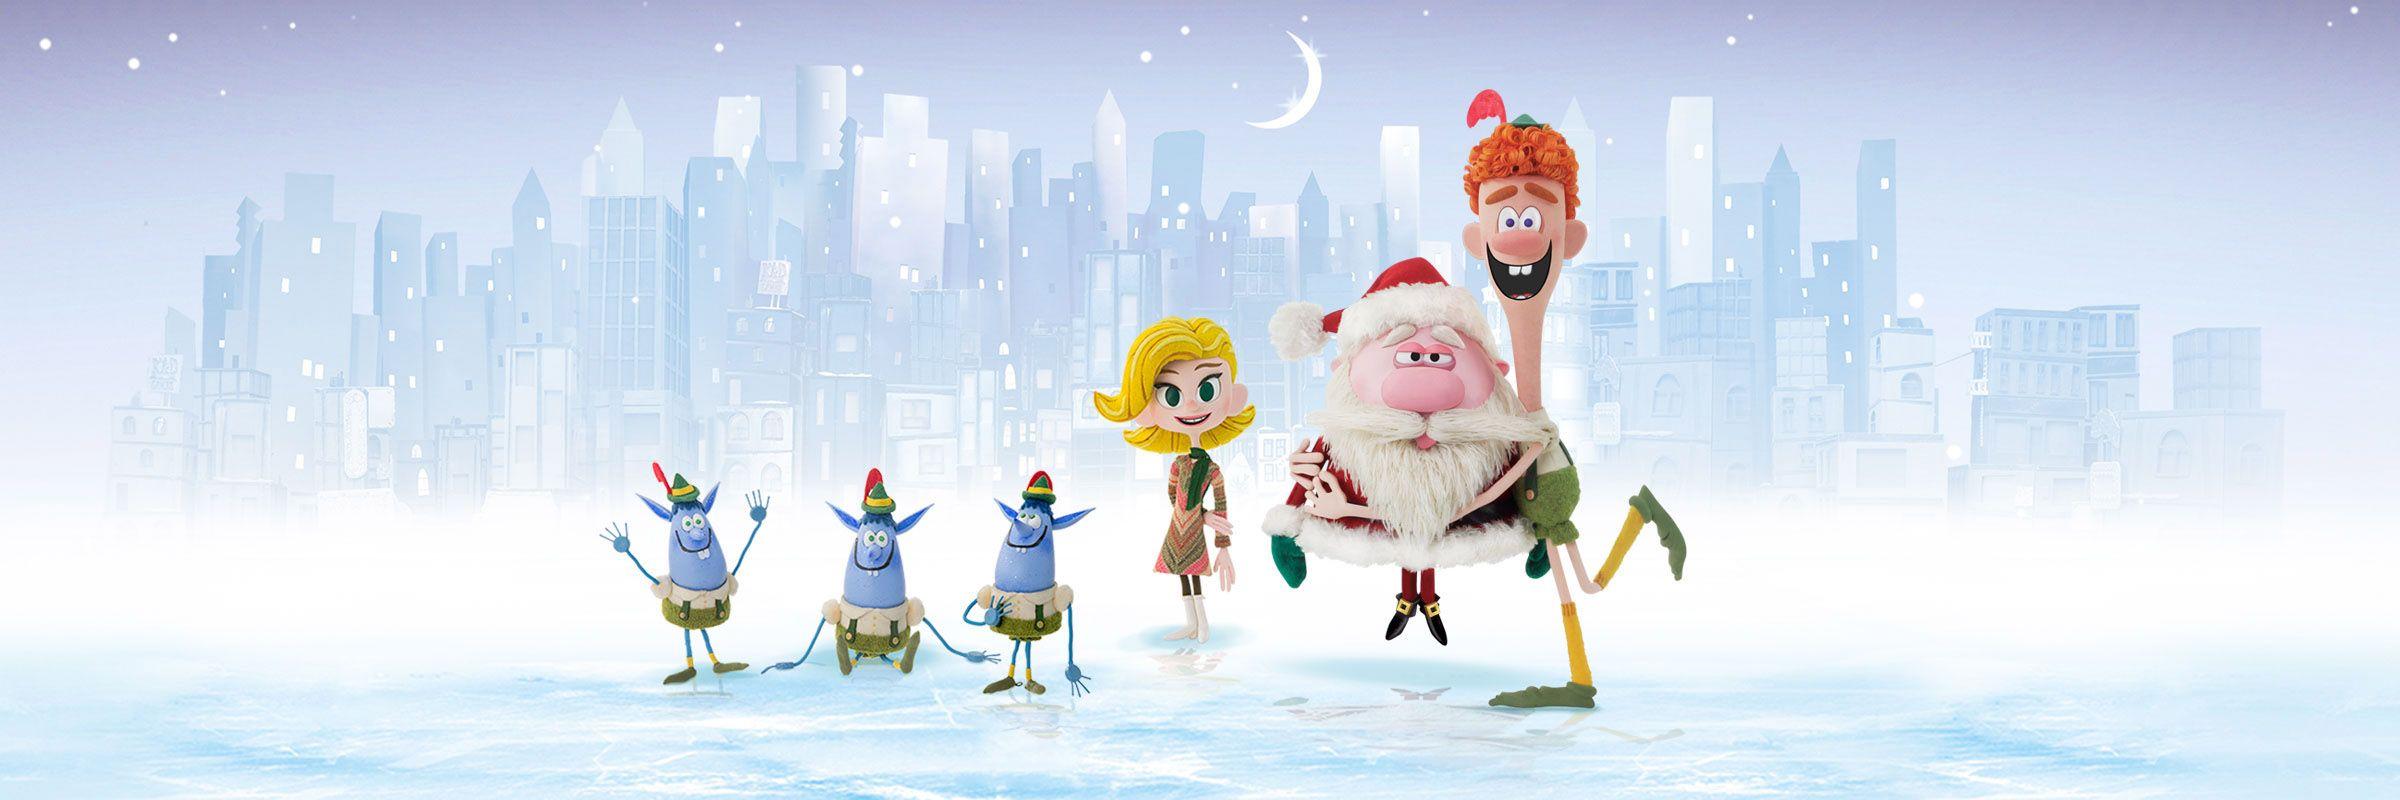 Elf Buddys Musical Christmas.Elf Buddy S Musical Christmas Full Movie Movies Anywhere